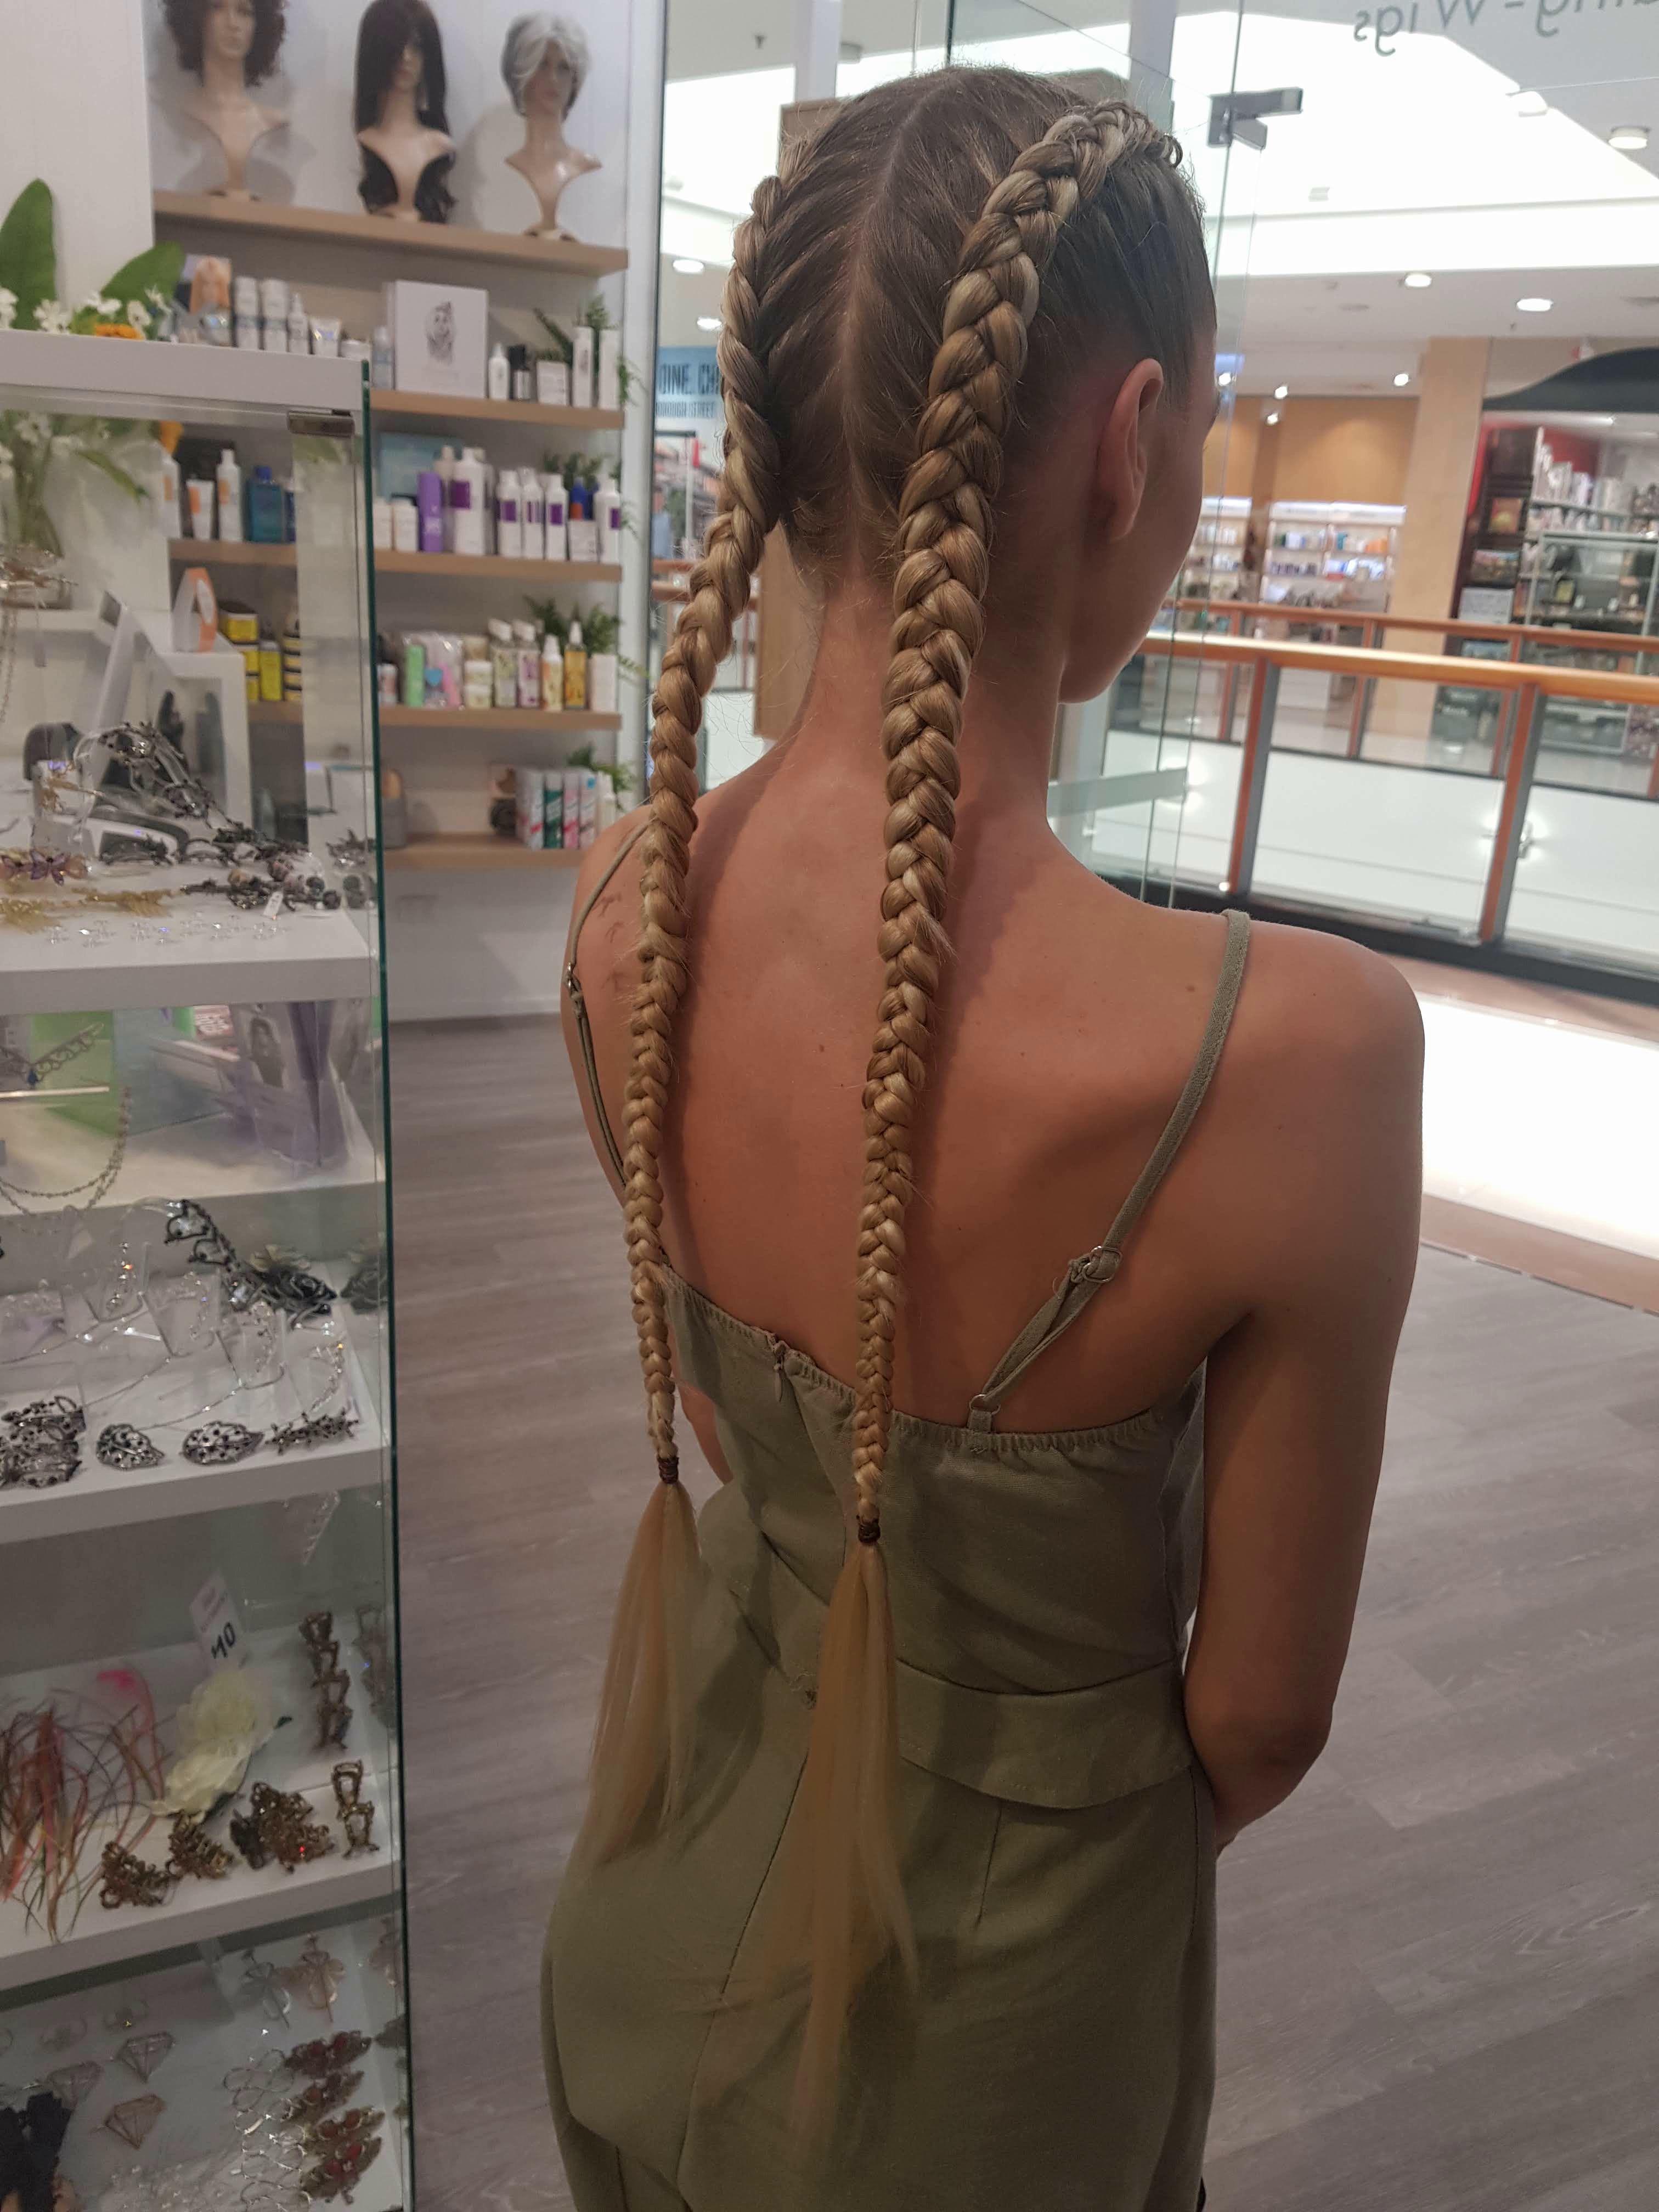 Long Blonde Dutch Braid Extensions Braid In Hair Extensions Braids With Extensions Hair Styles